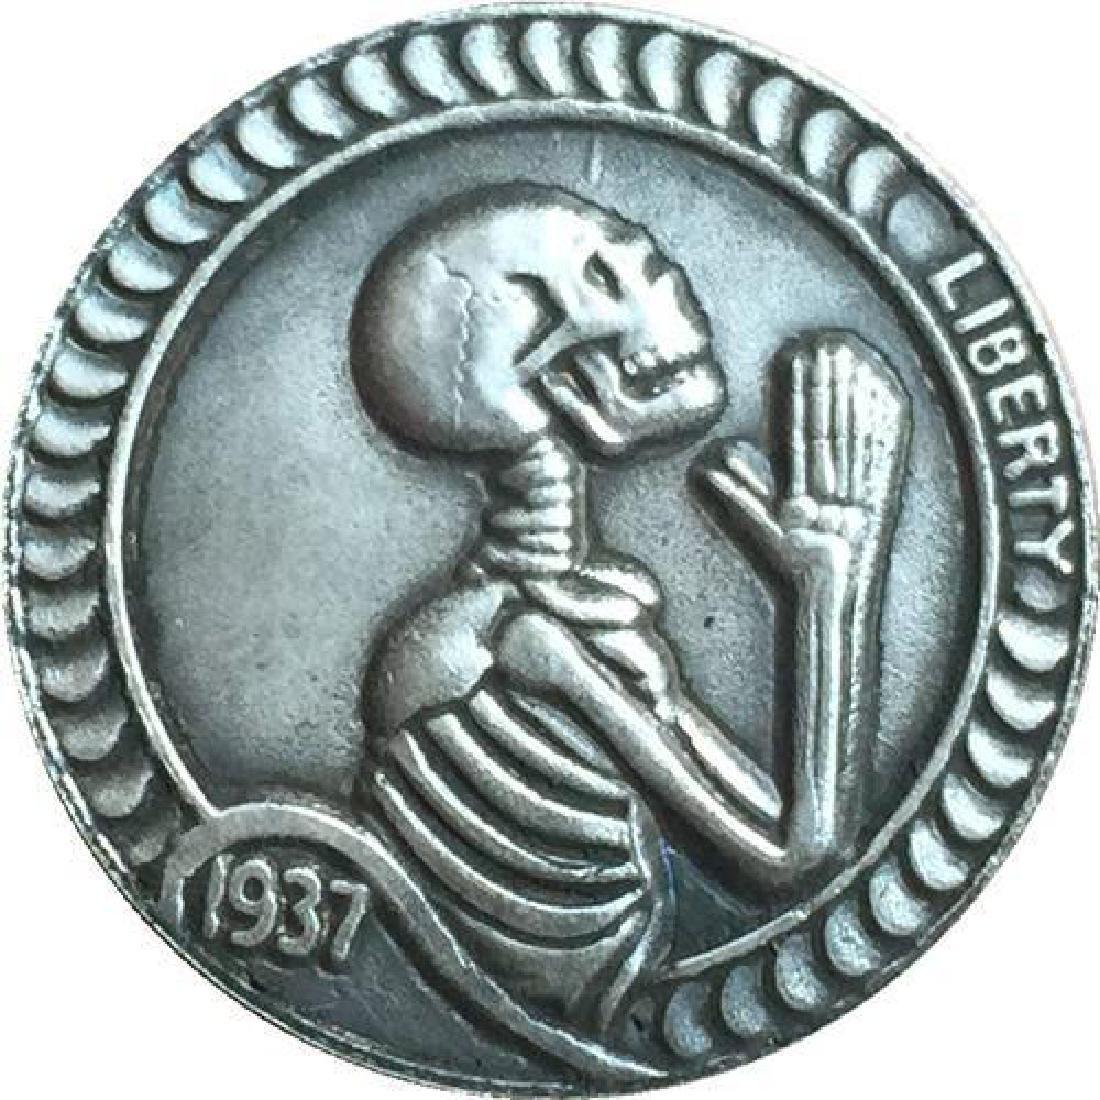 1937 USA Praying Skeleton Buffalo Coin